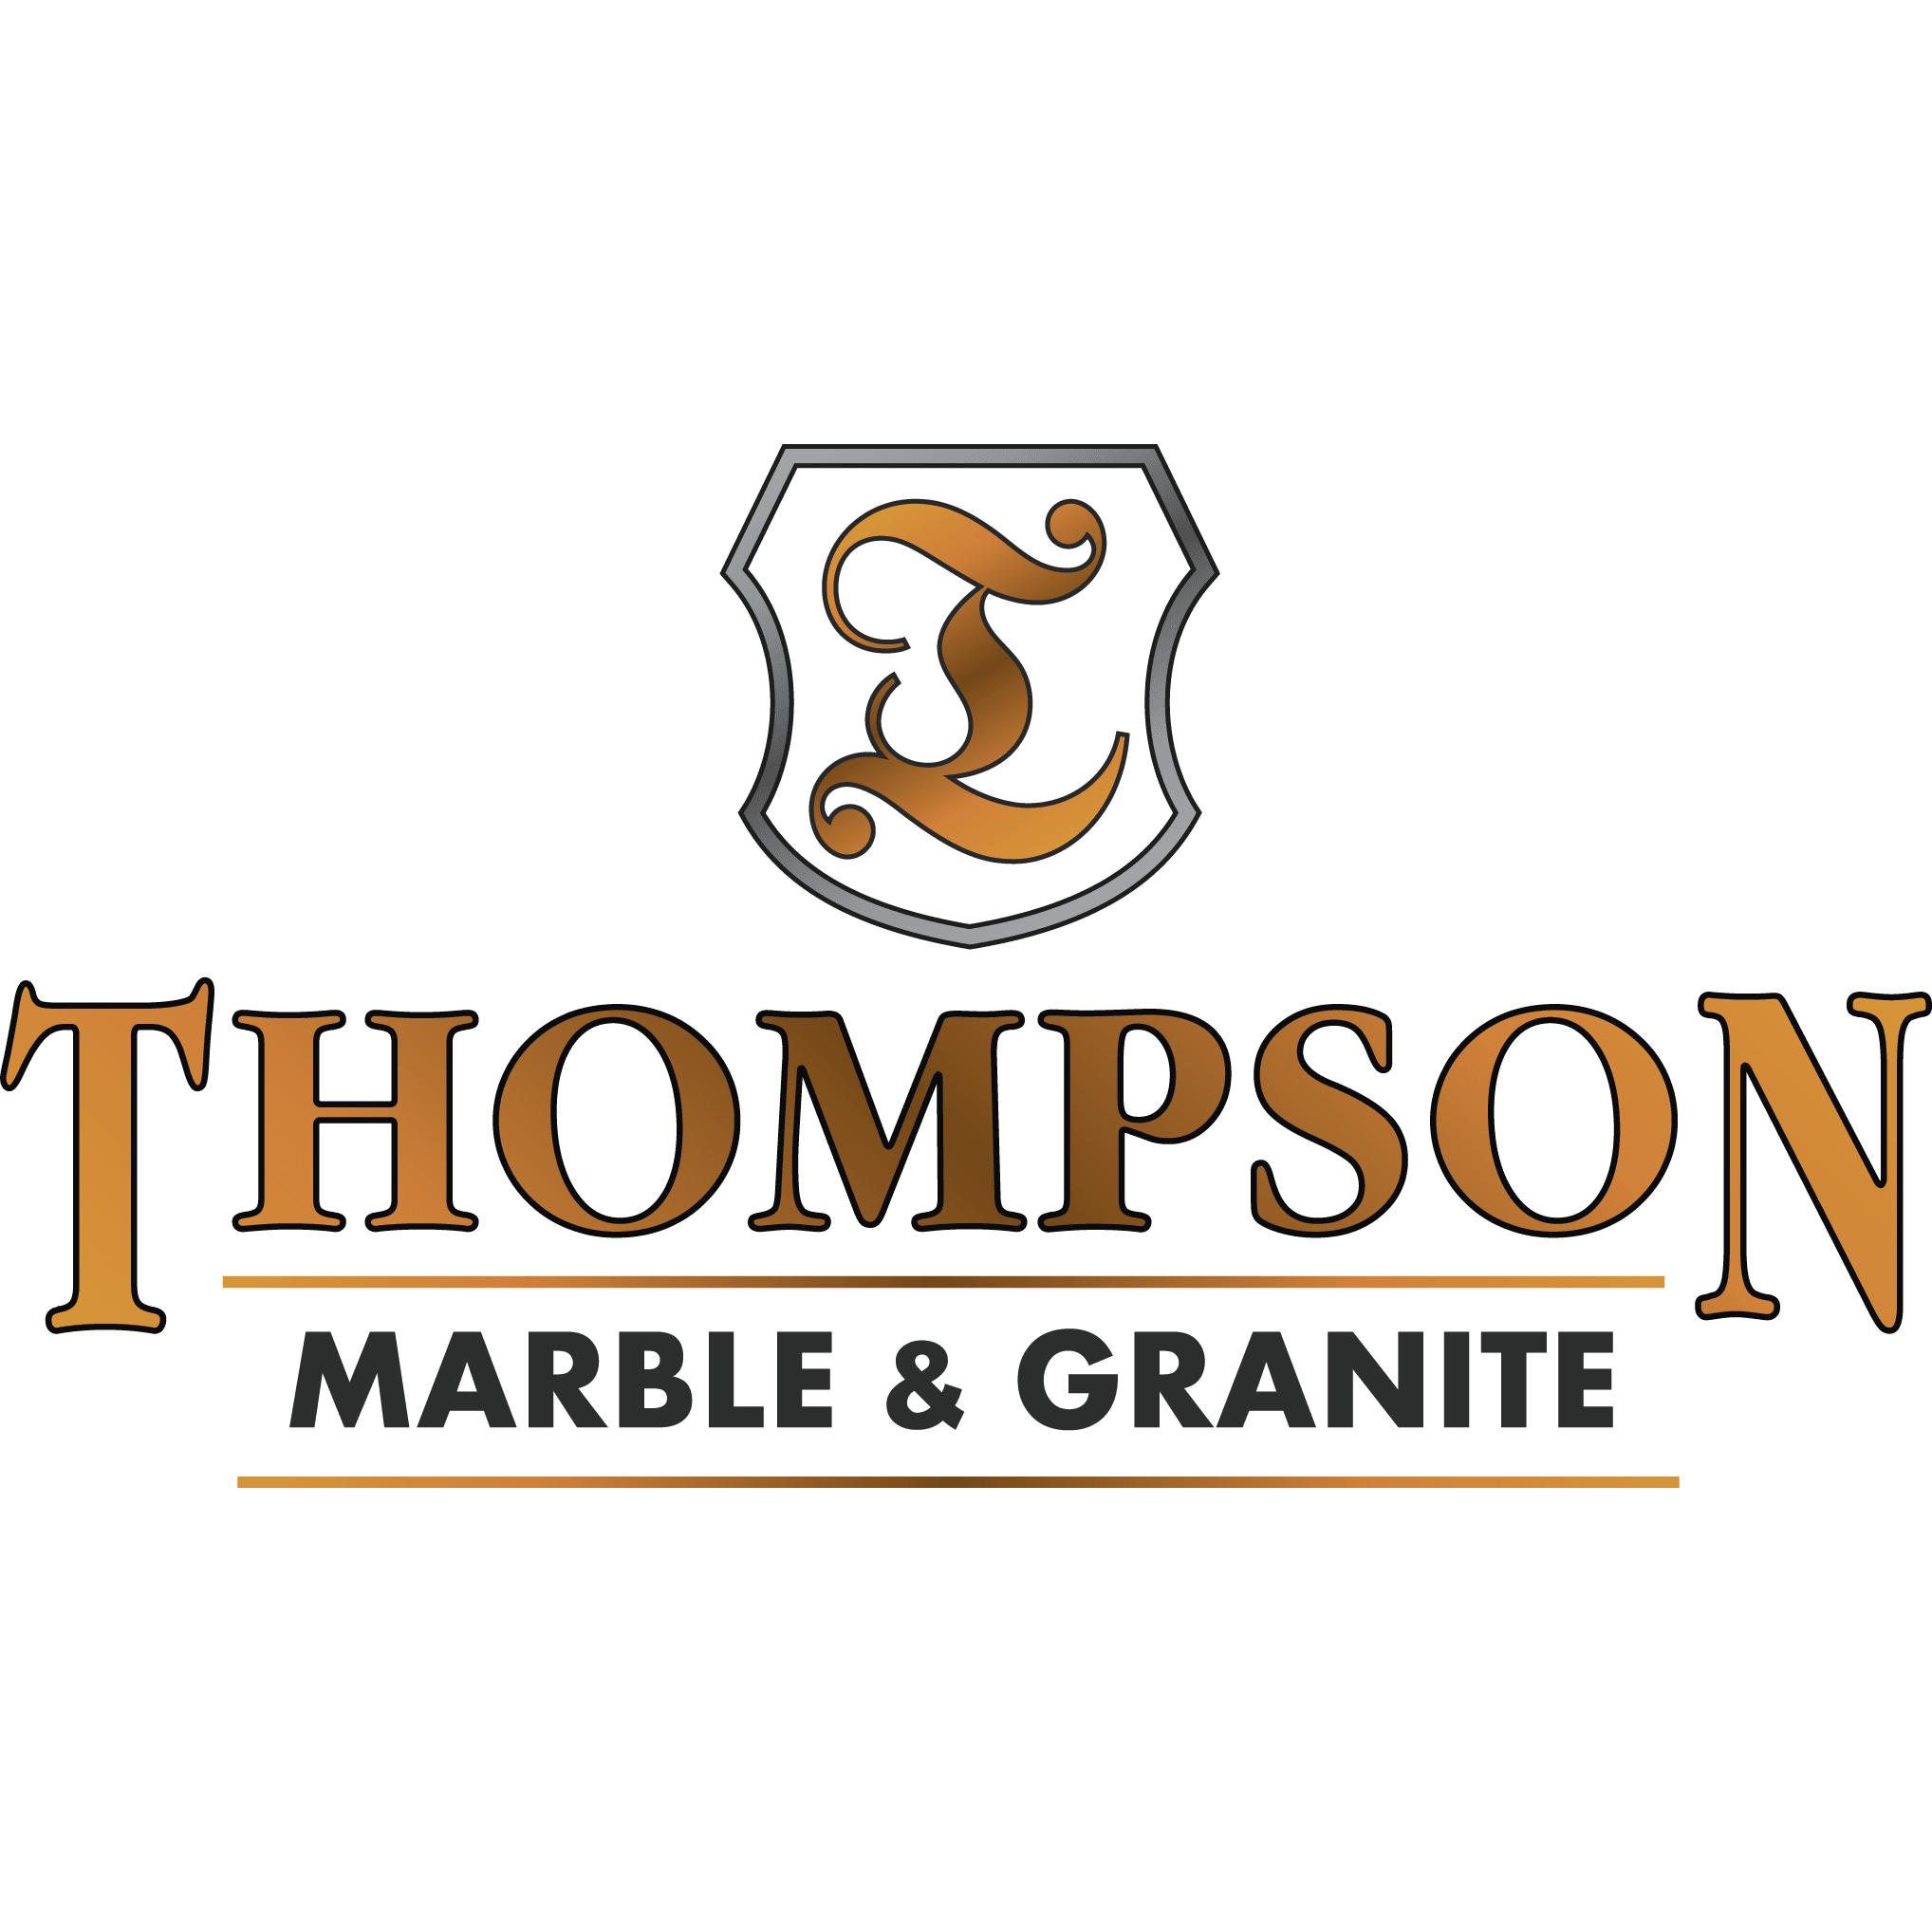 Thompson Marble and Granite